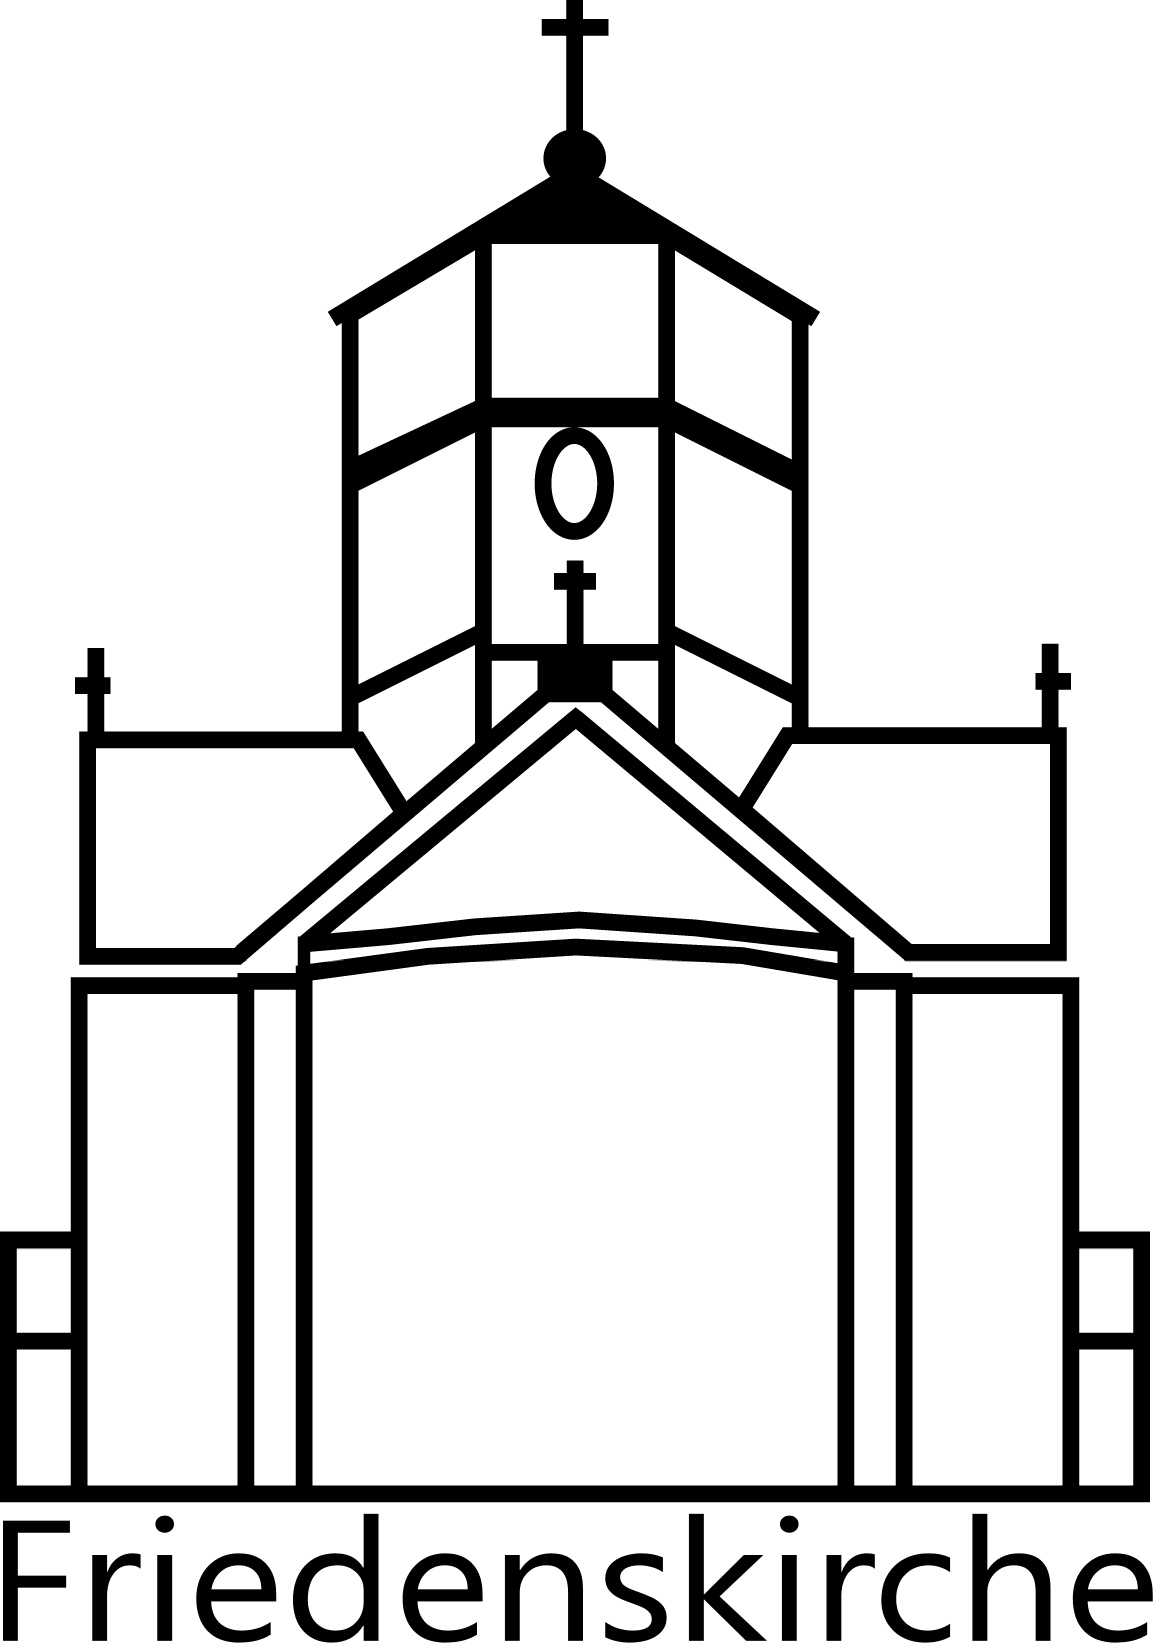 Wortbildmarke-Friedenskirche